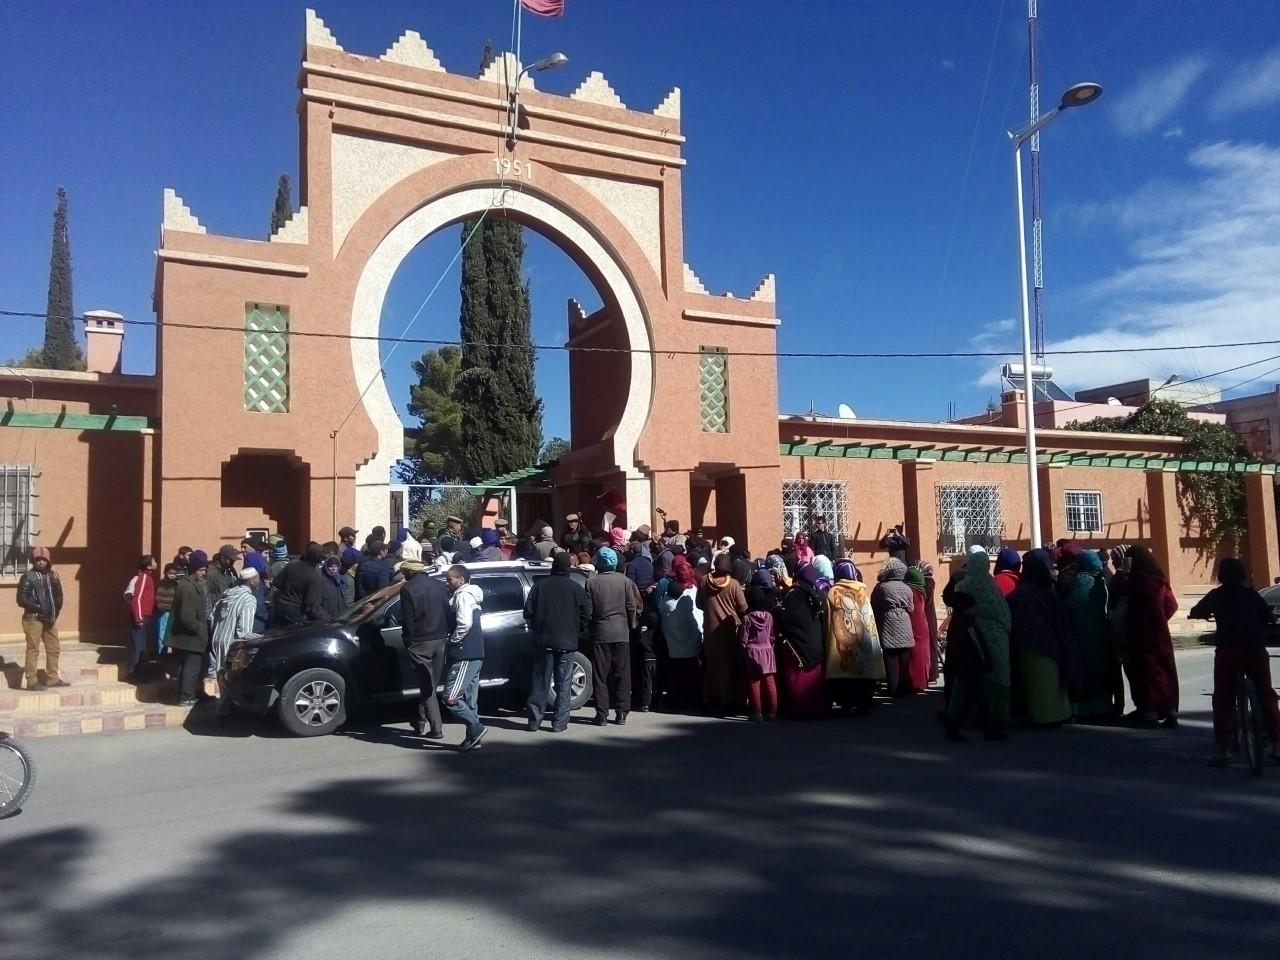 Photo of الريش / ساكنة حي بو يليلي  تخرج في مسيرة احتجاجية للمطالبة ببناء مدرسة